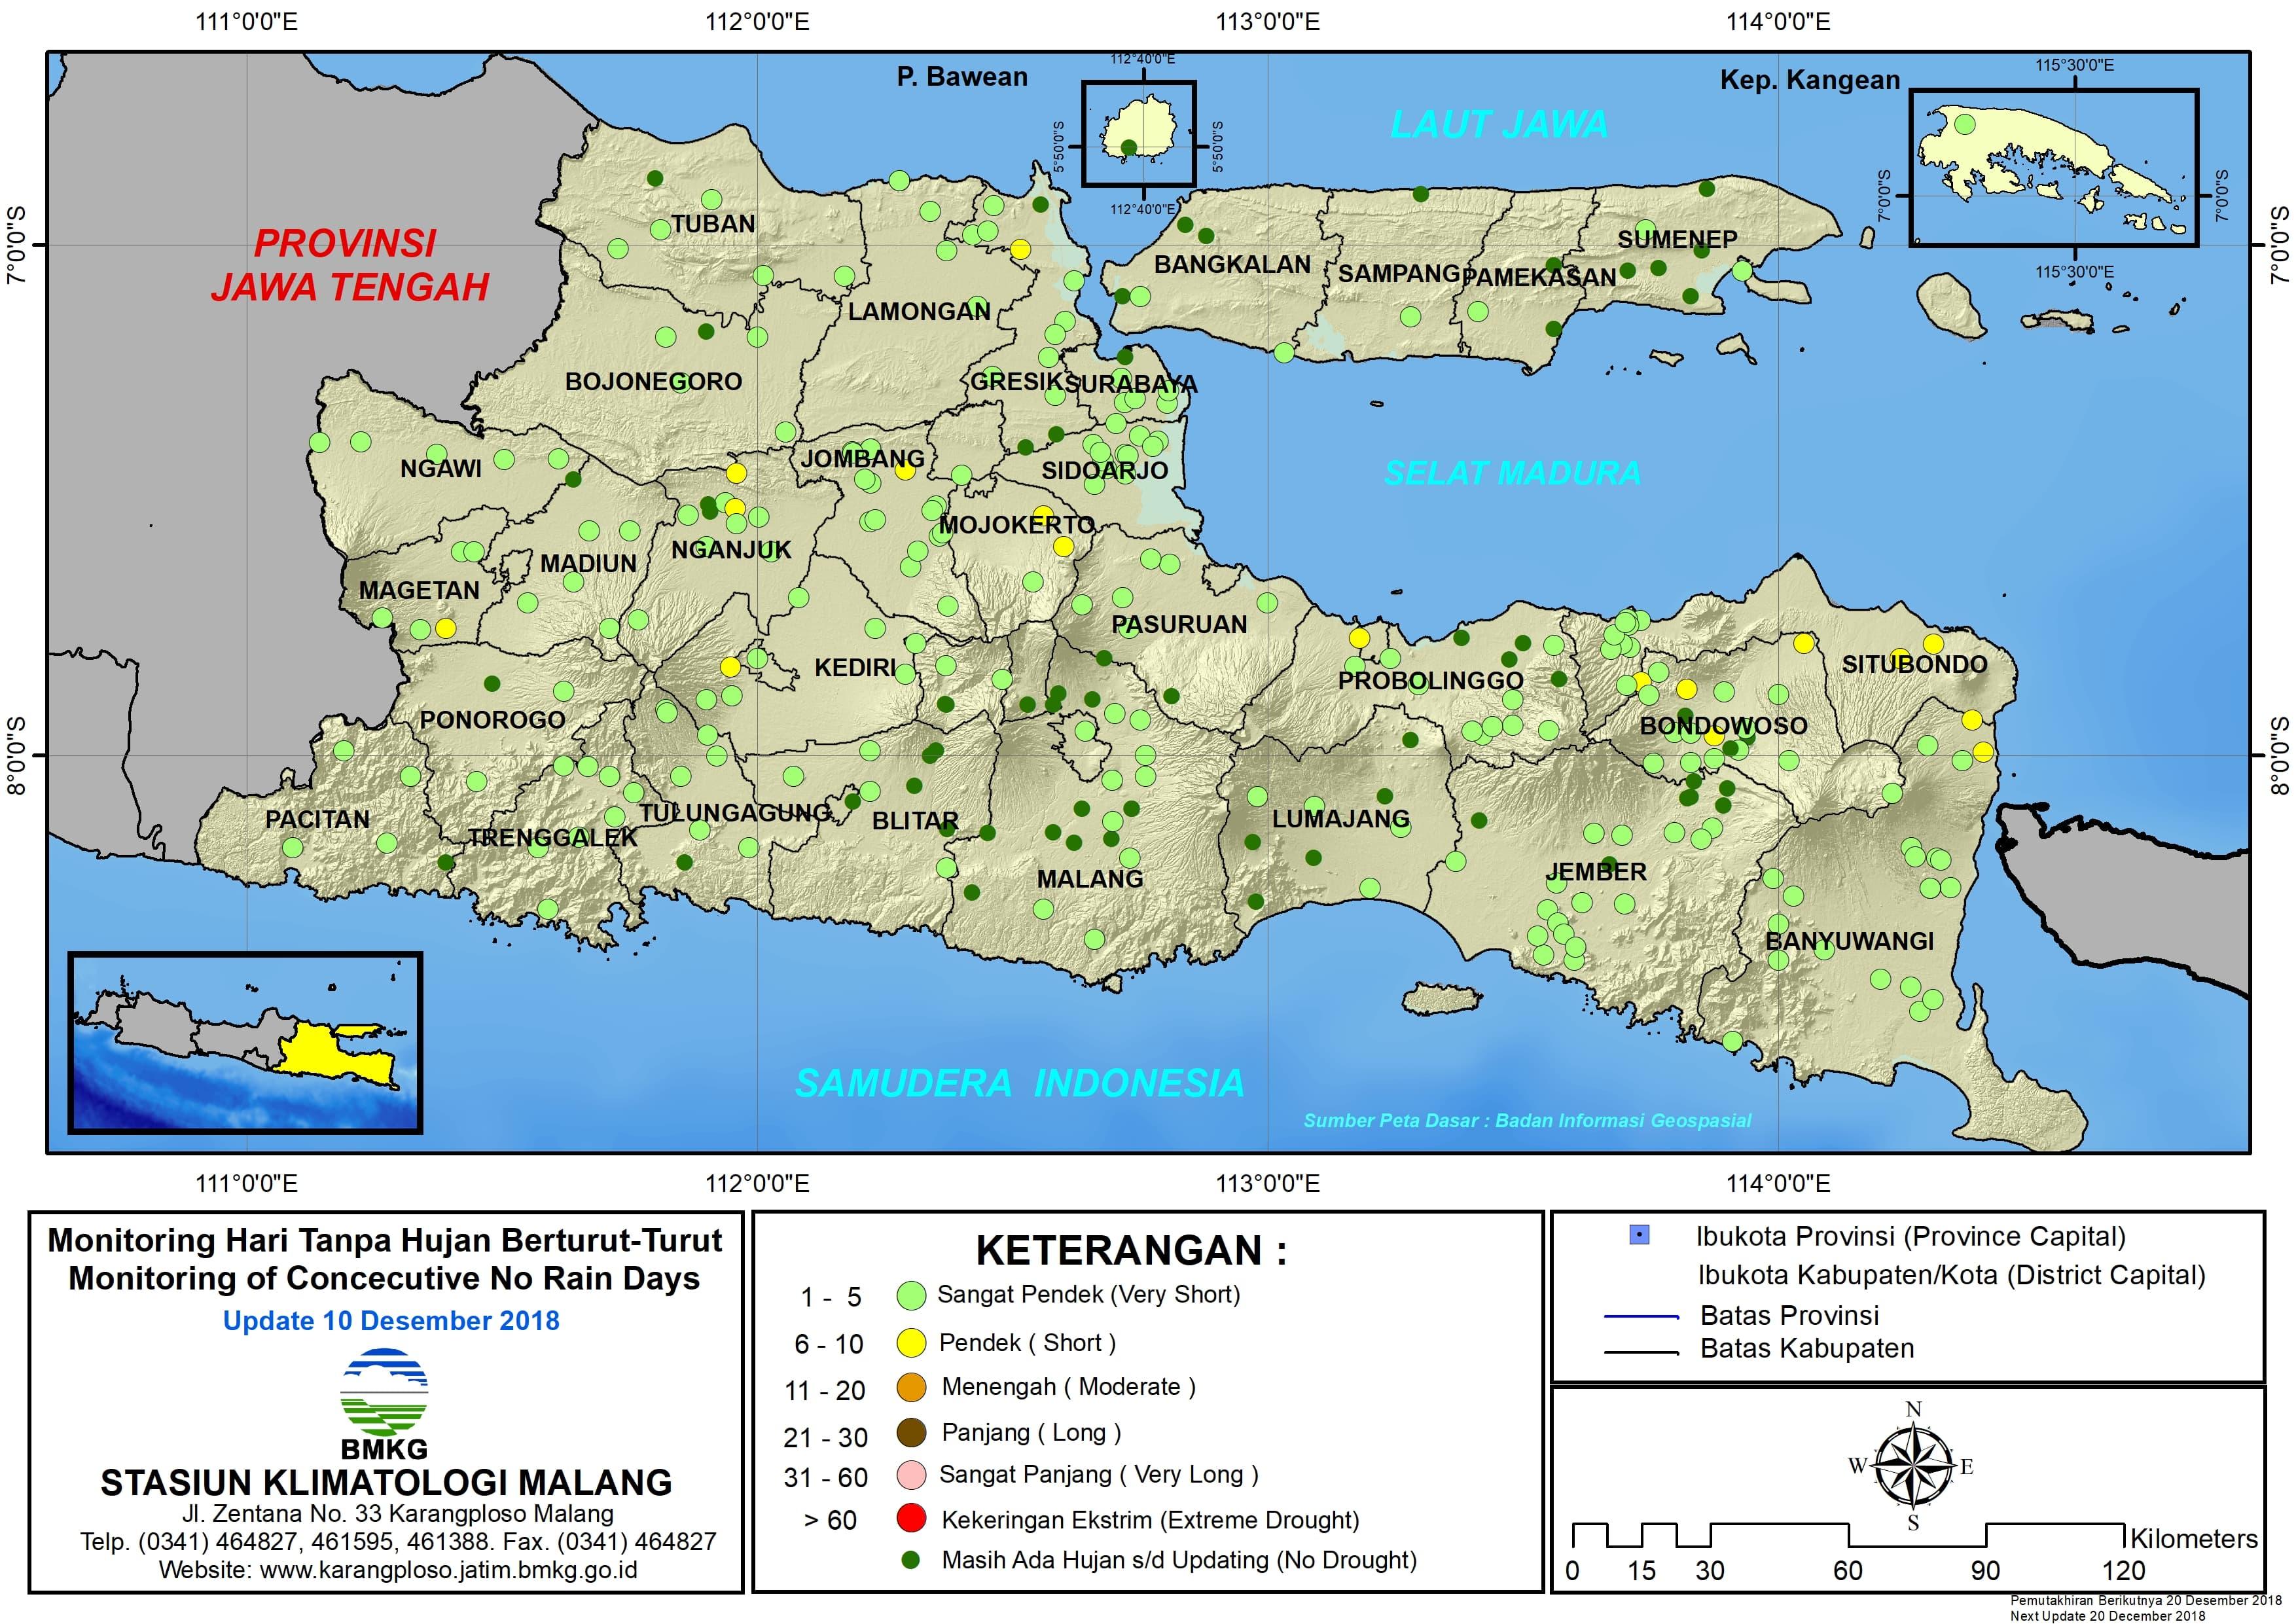 Peta Monitoring Hari Tanpa Hujan Berturut Turut Update 10 Desember 2018 di Provinsi Jawa Timur